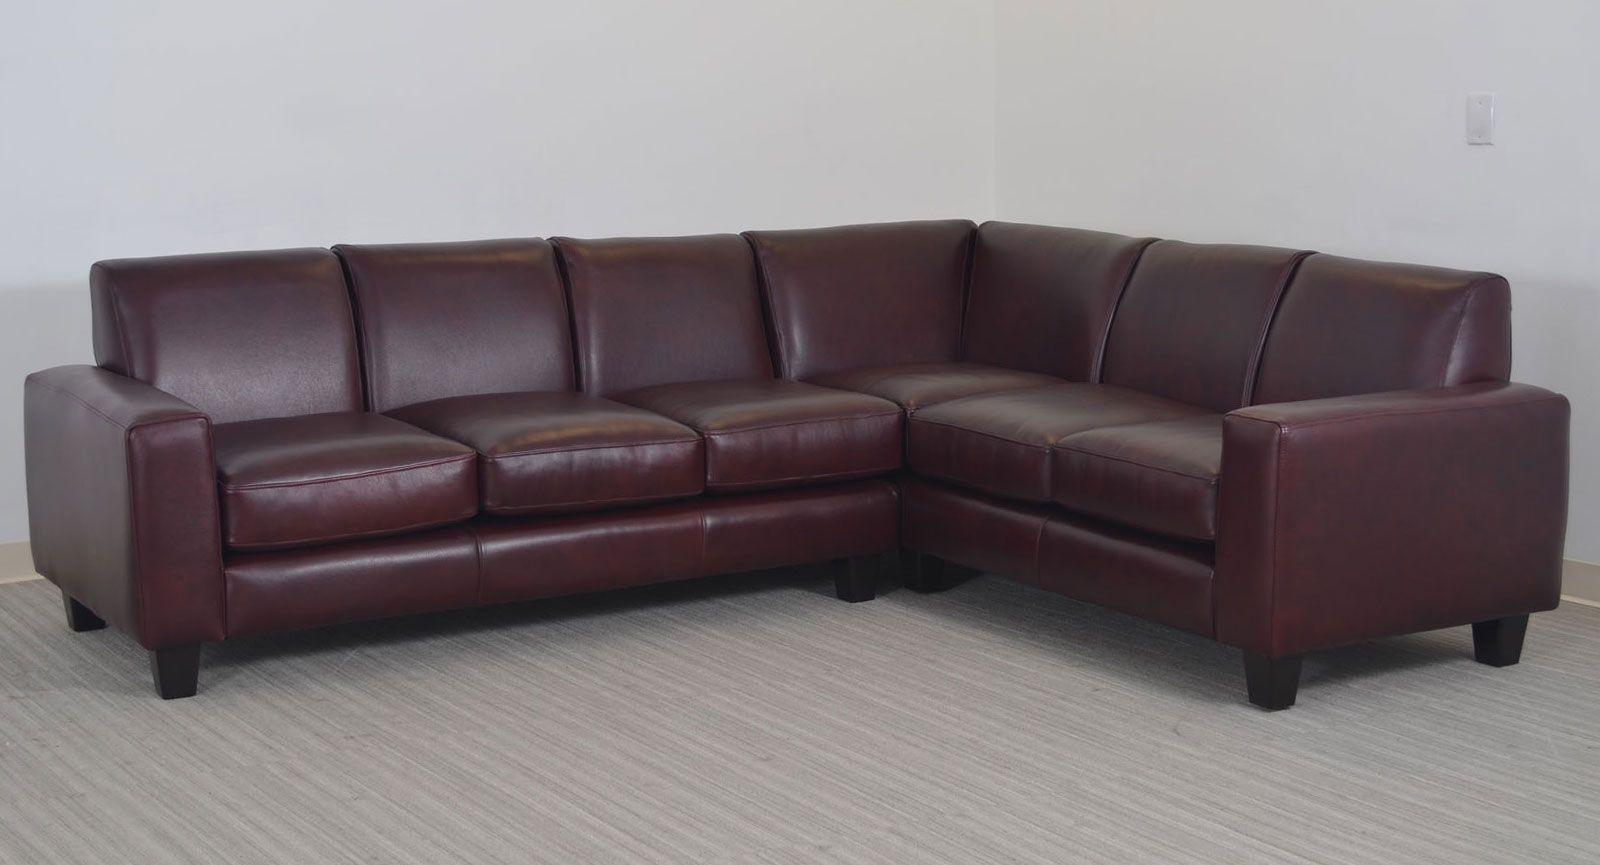 Wondrous The Elegante Sofa Sectional By The Leather Sofa Co A Spiritservingveterans Wood Chair Design Ideas Spiritservingveteransorg